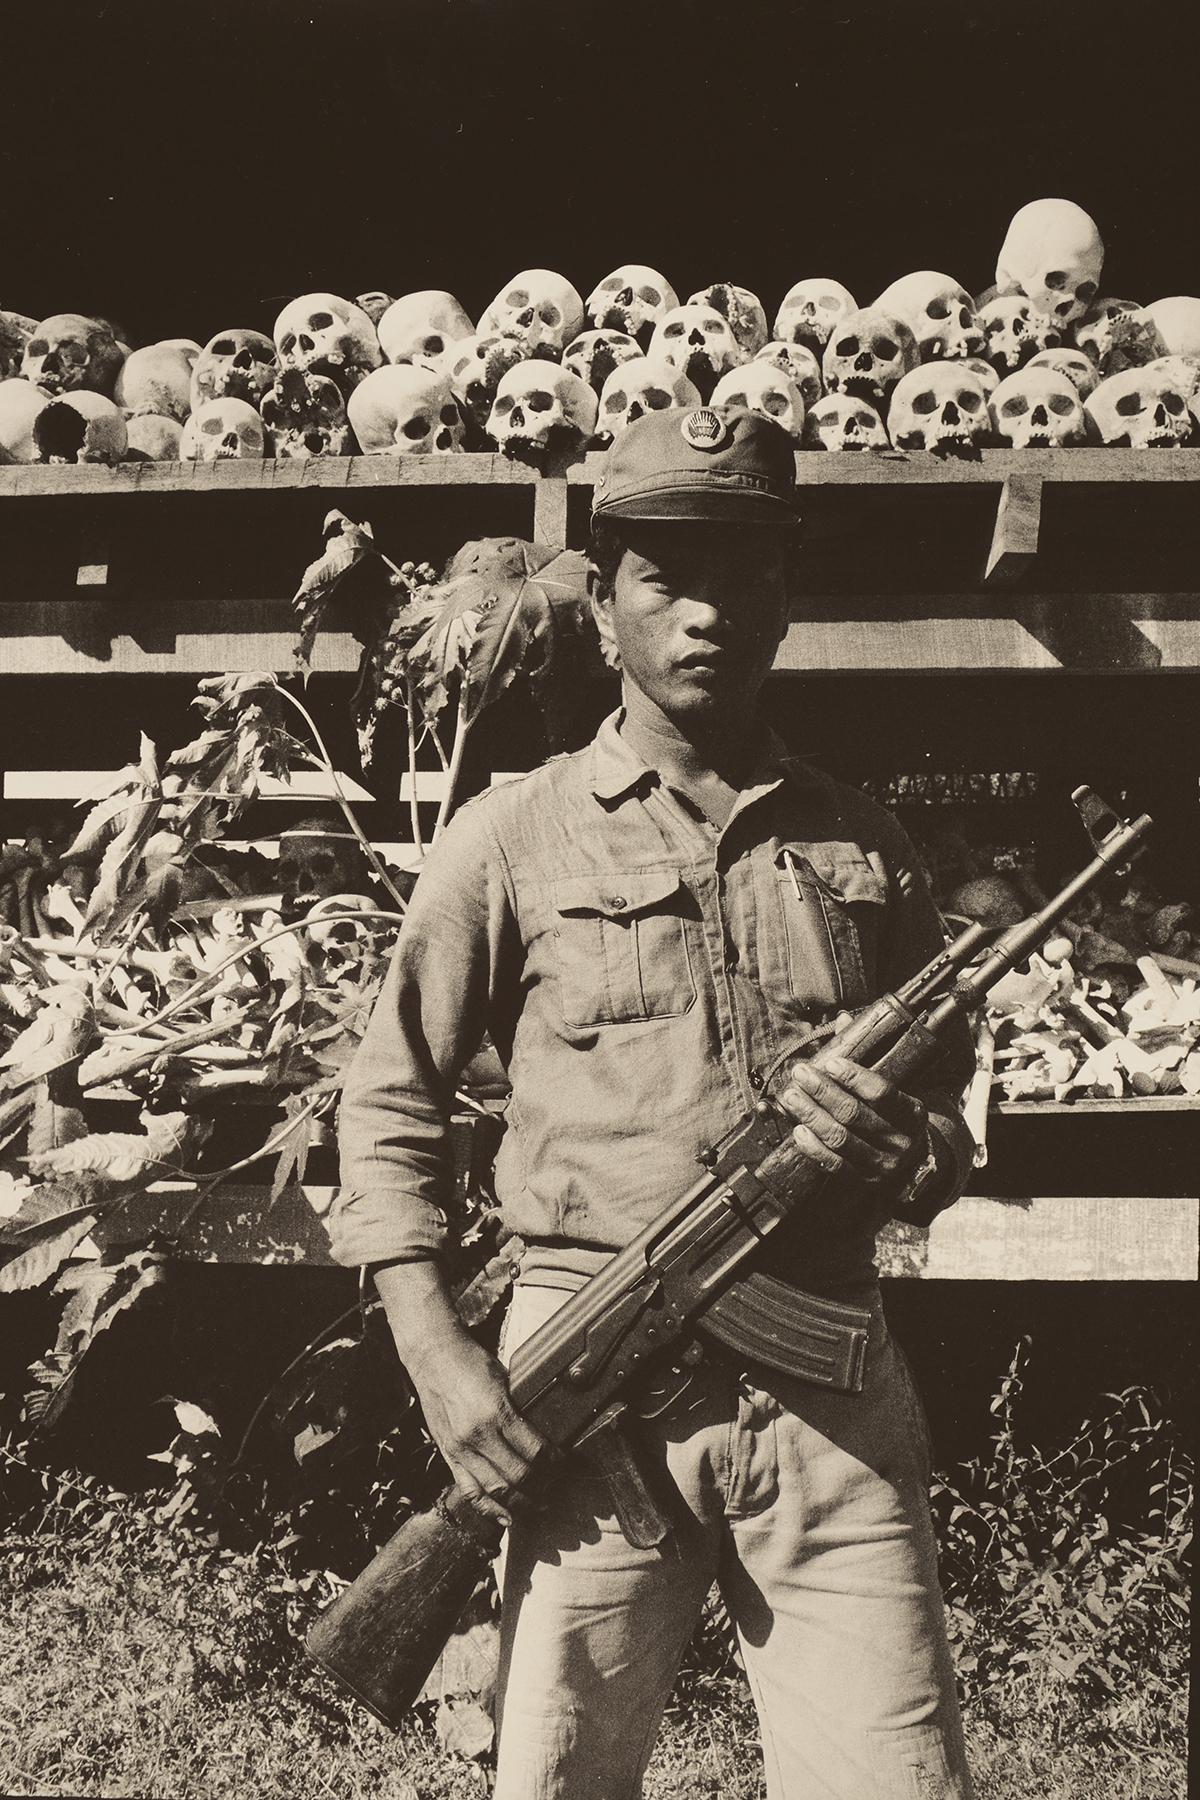 Fotó: Stalter György: Kambodzsa, 1984 © Stalter György